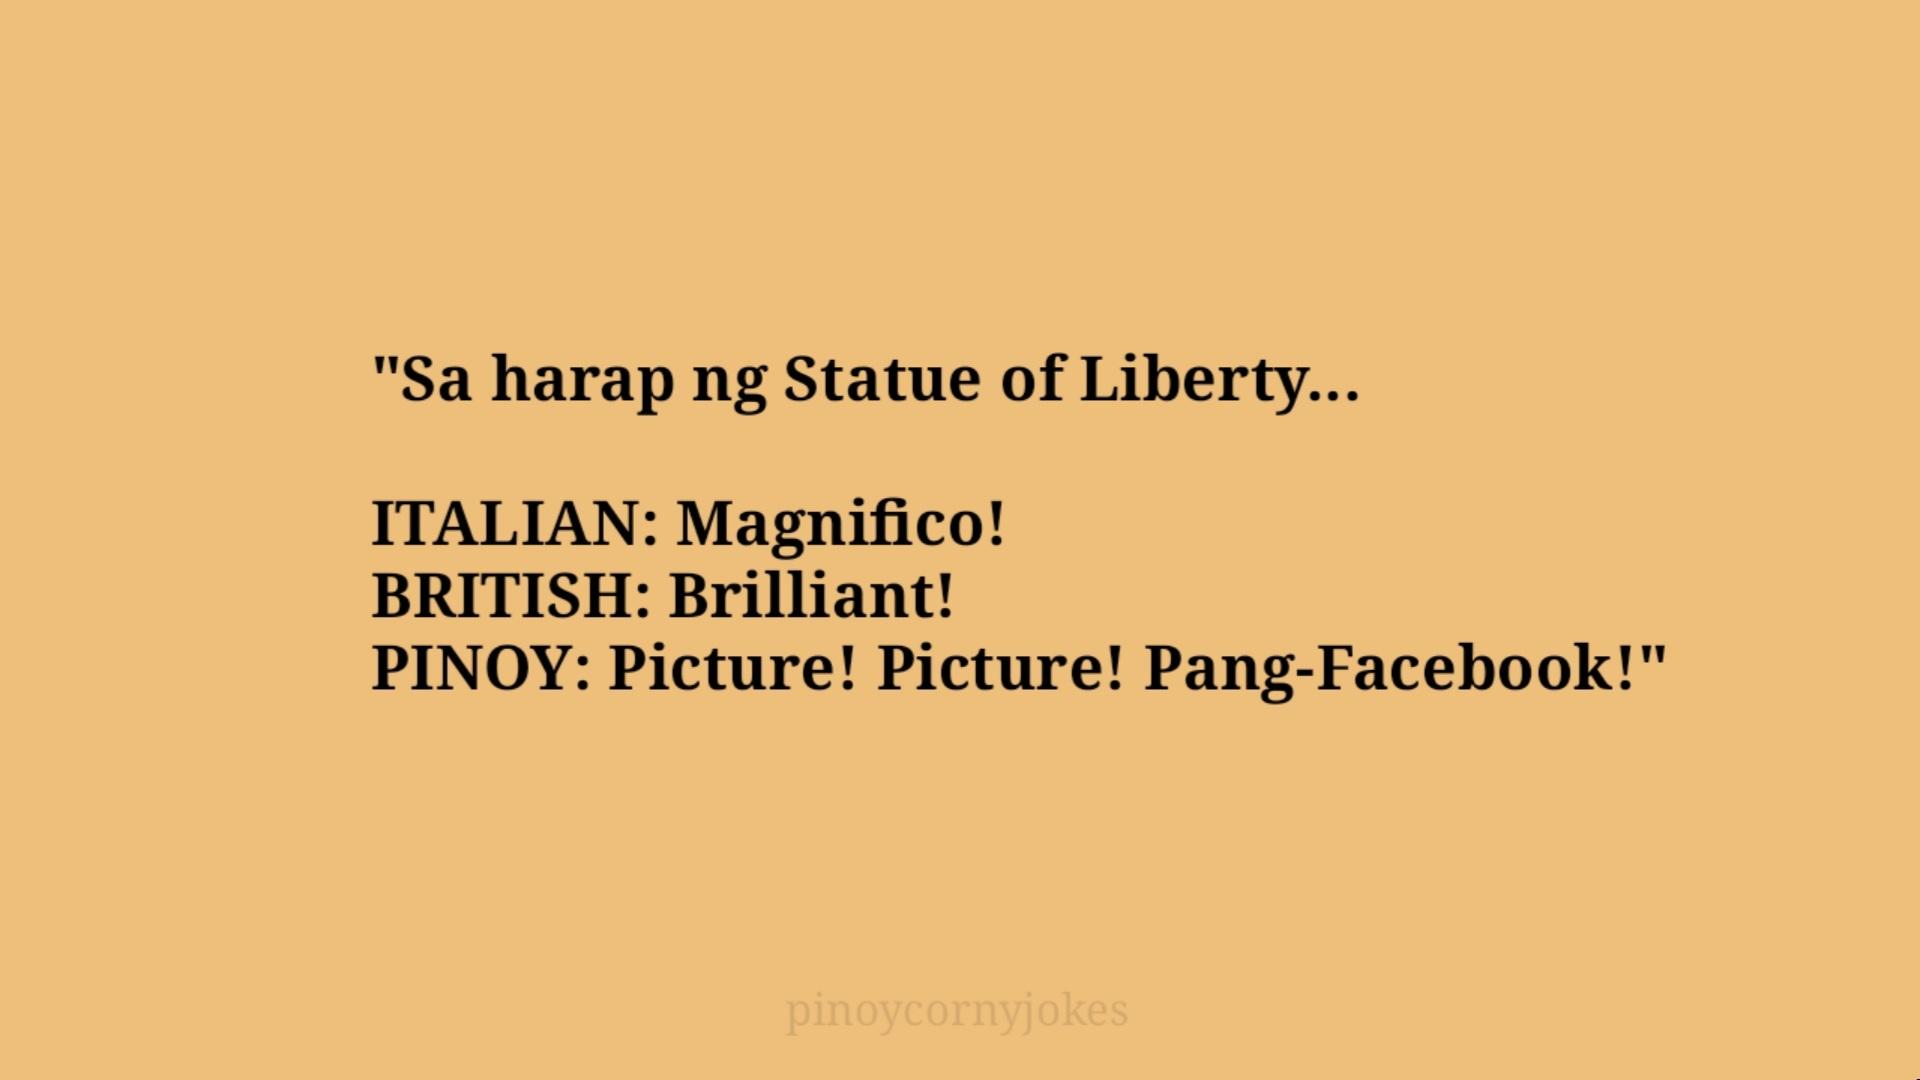 statue pinoy  tagalog jokes 2021